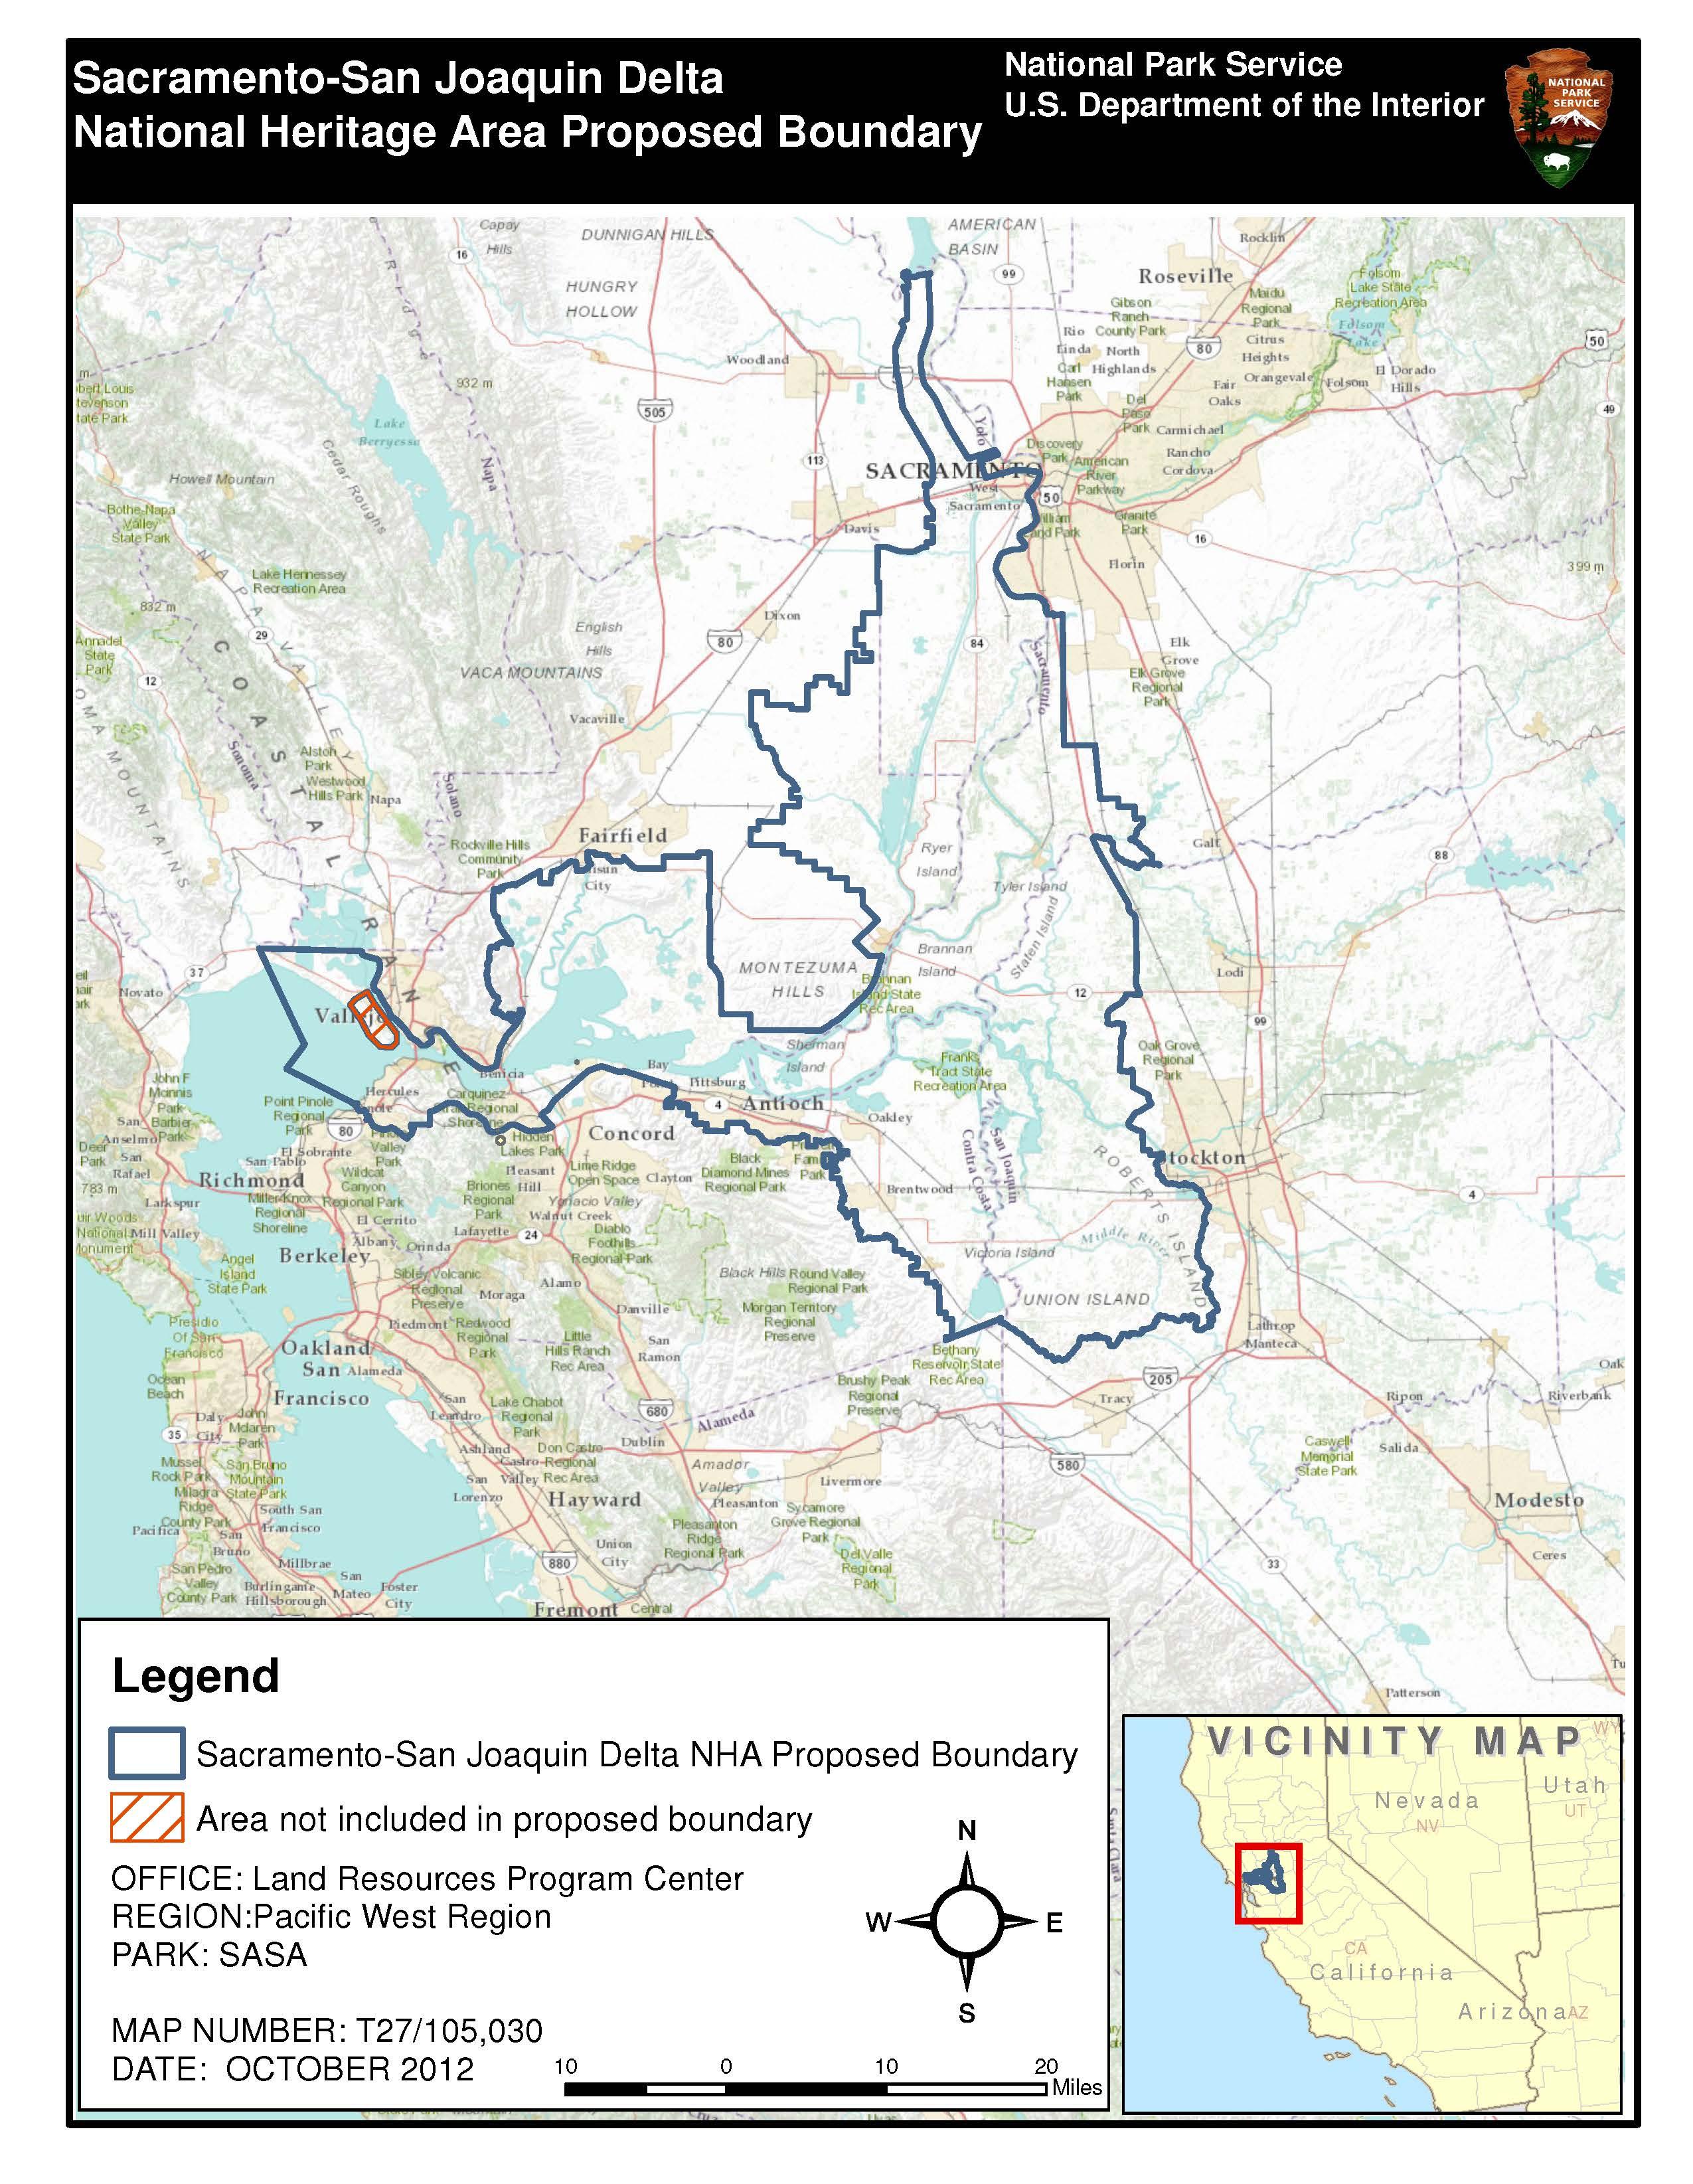 Washington March 28 2017 U S Senators Dianne Feinstein And Kamala Harris Both D Calif Reintroduced The Sacramento San Joaquin Delta National Heritage